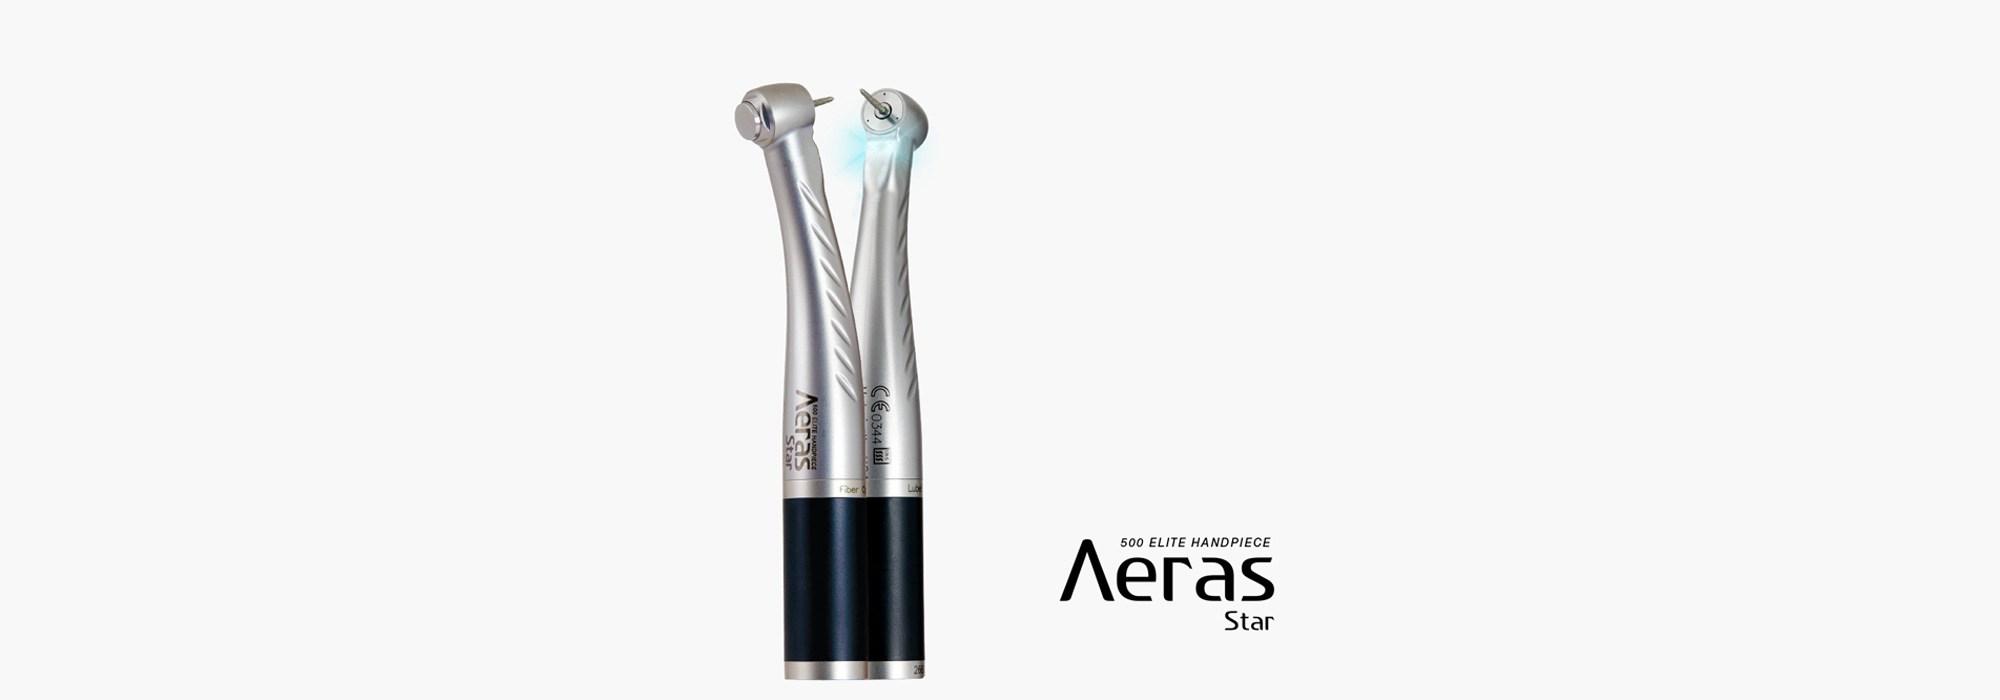 Aeras Star